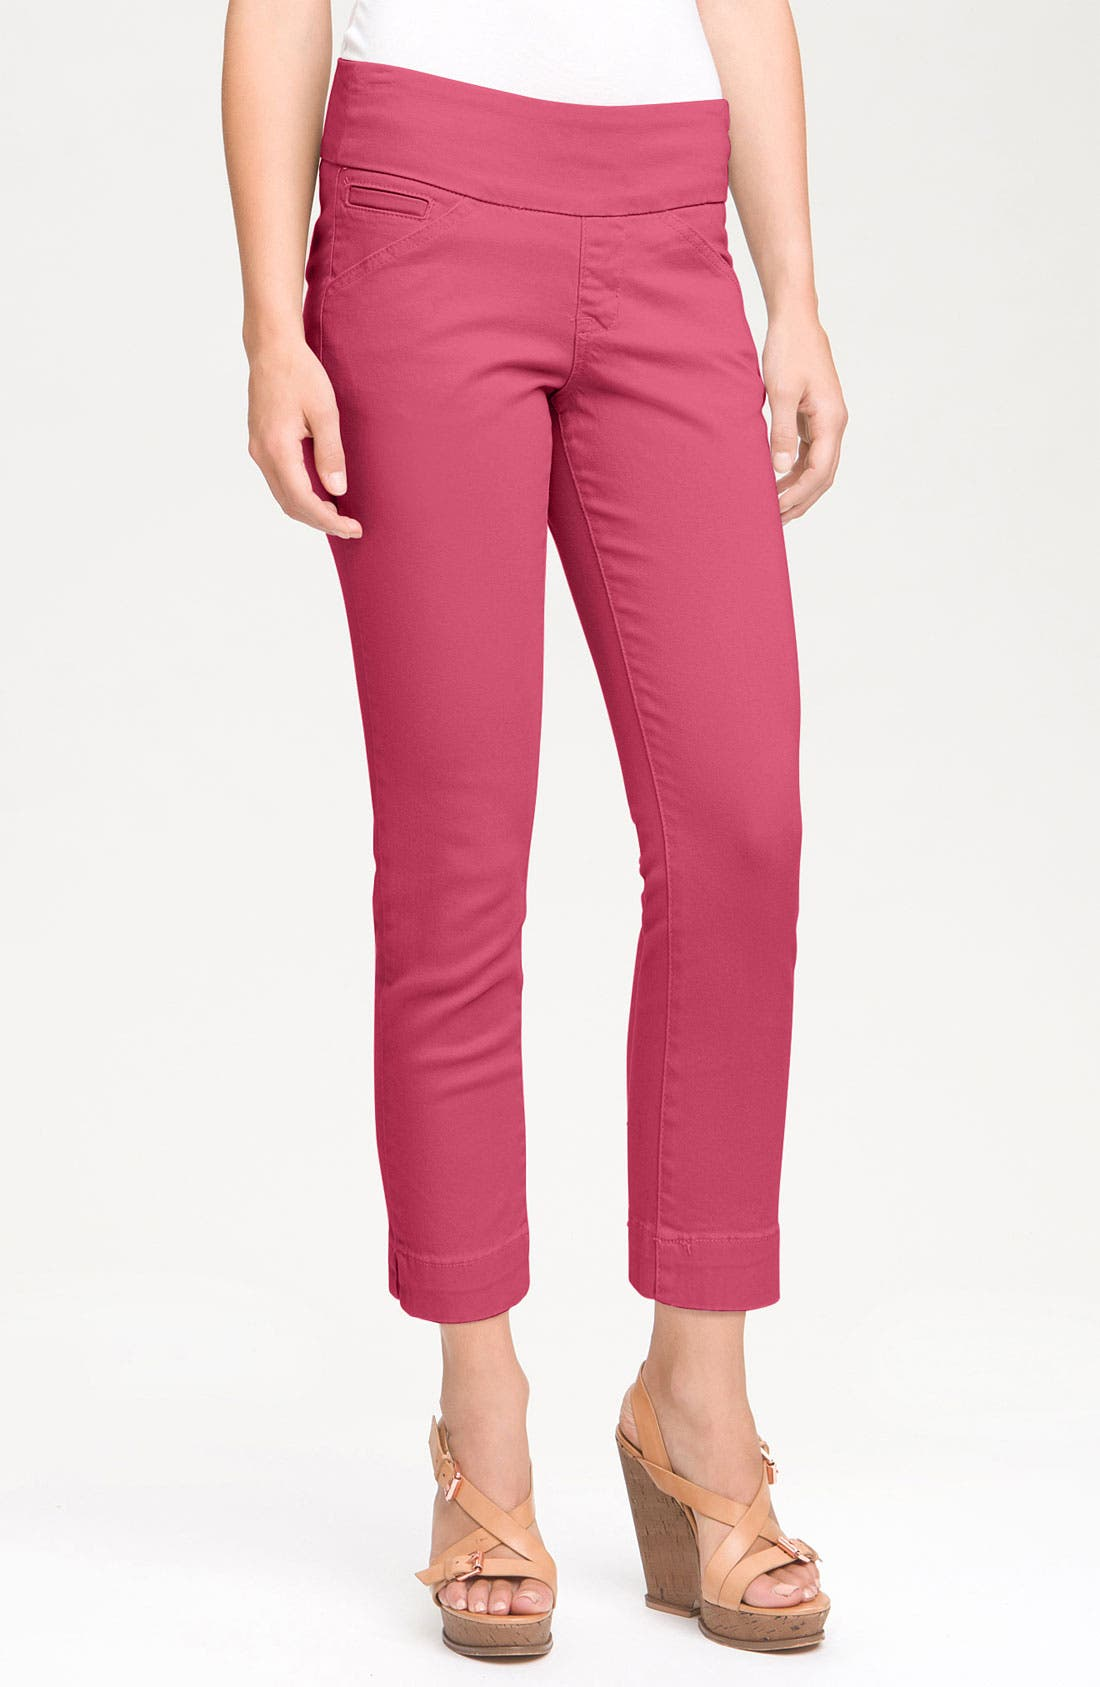 Alternate Image 1 Selected - Jag Jeans 'Attie' Slim Ankle Pants (Petite)